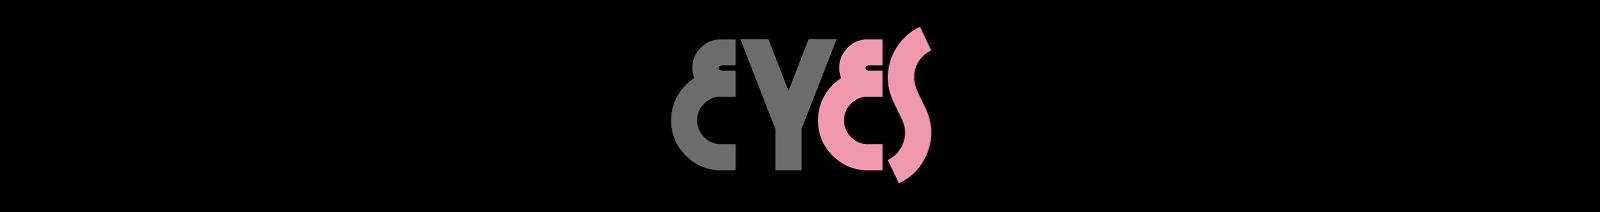 Eyes Title